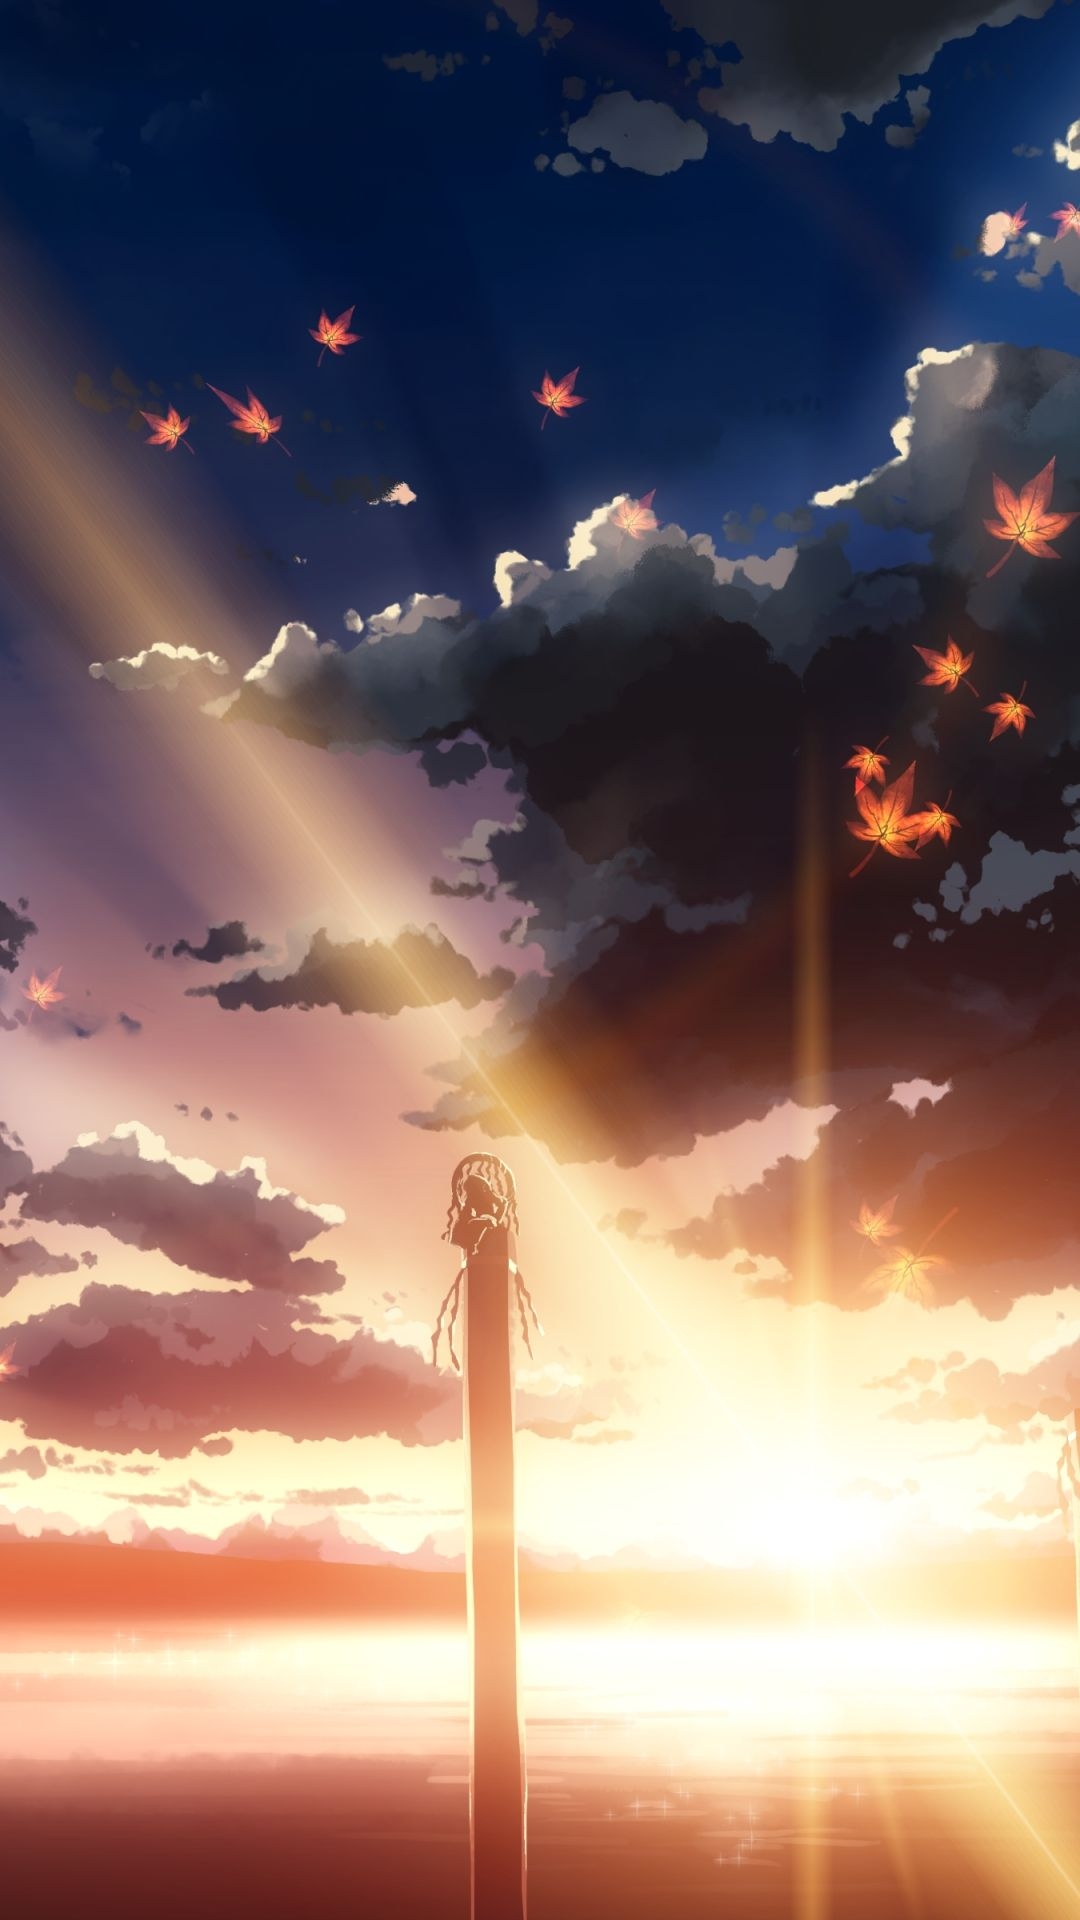 Sad Anime iPhone 6 wallpaper hd